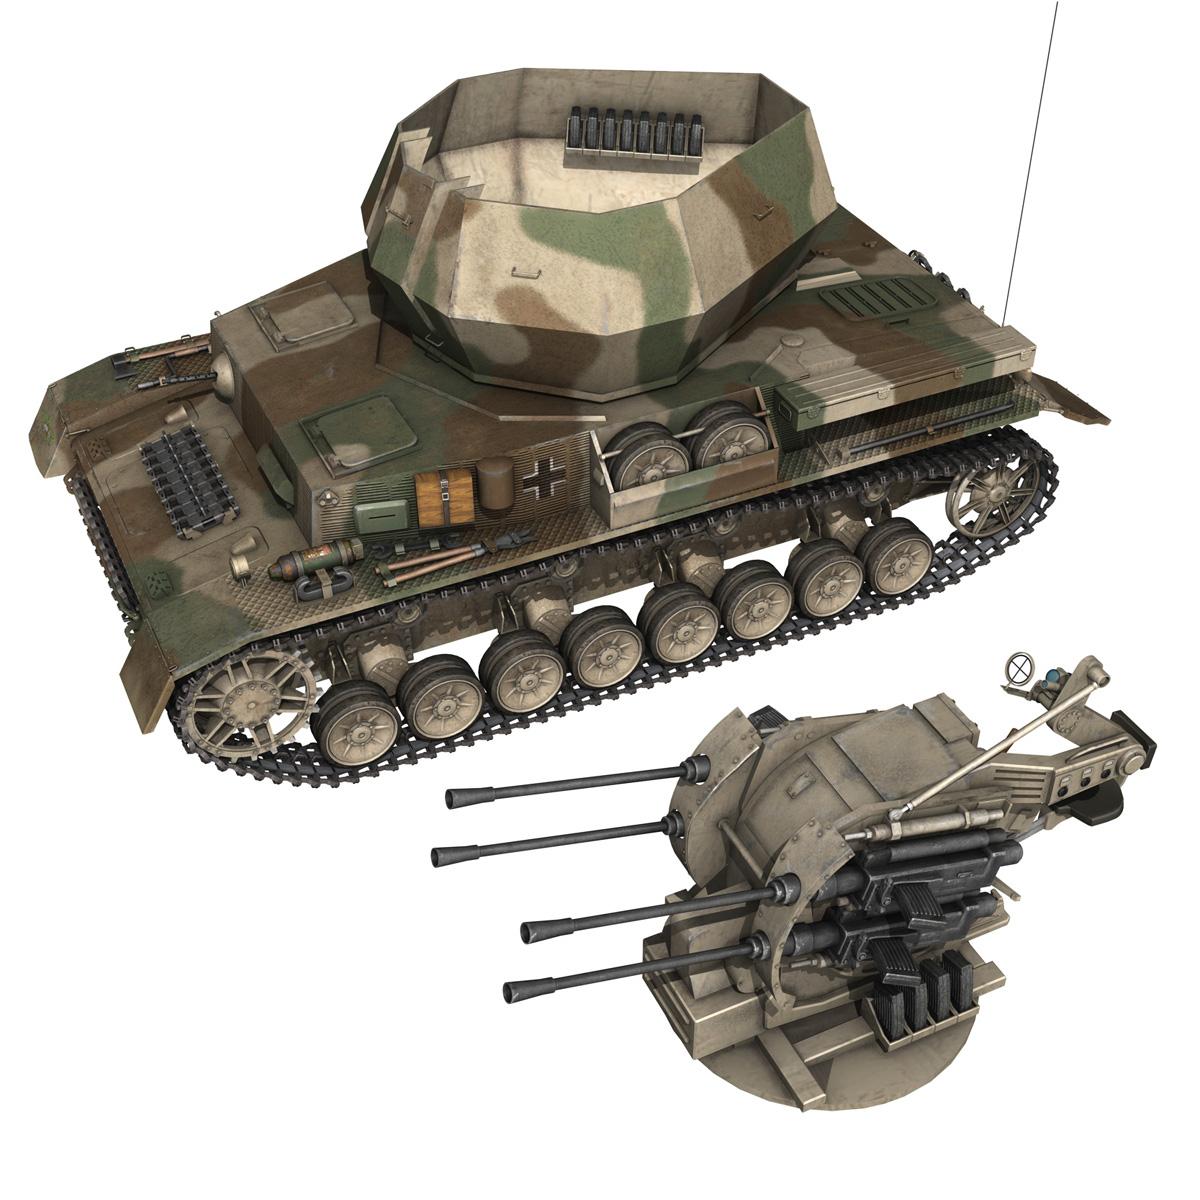 flakpanzer iv – wirbelwind – spzjgabt 654 3d model 3ds fbx c4d lwo obj 282314